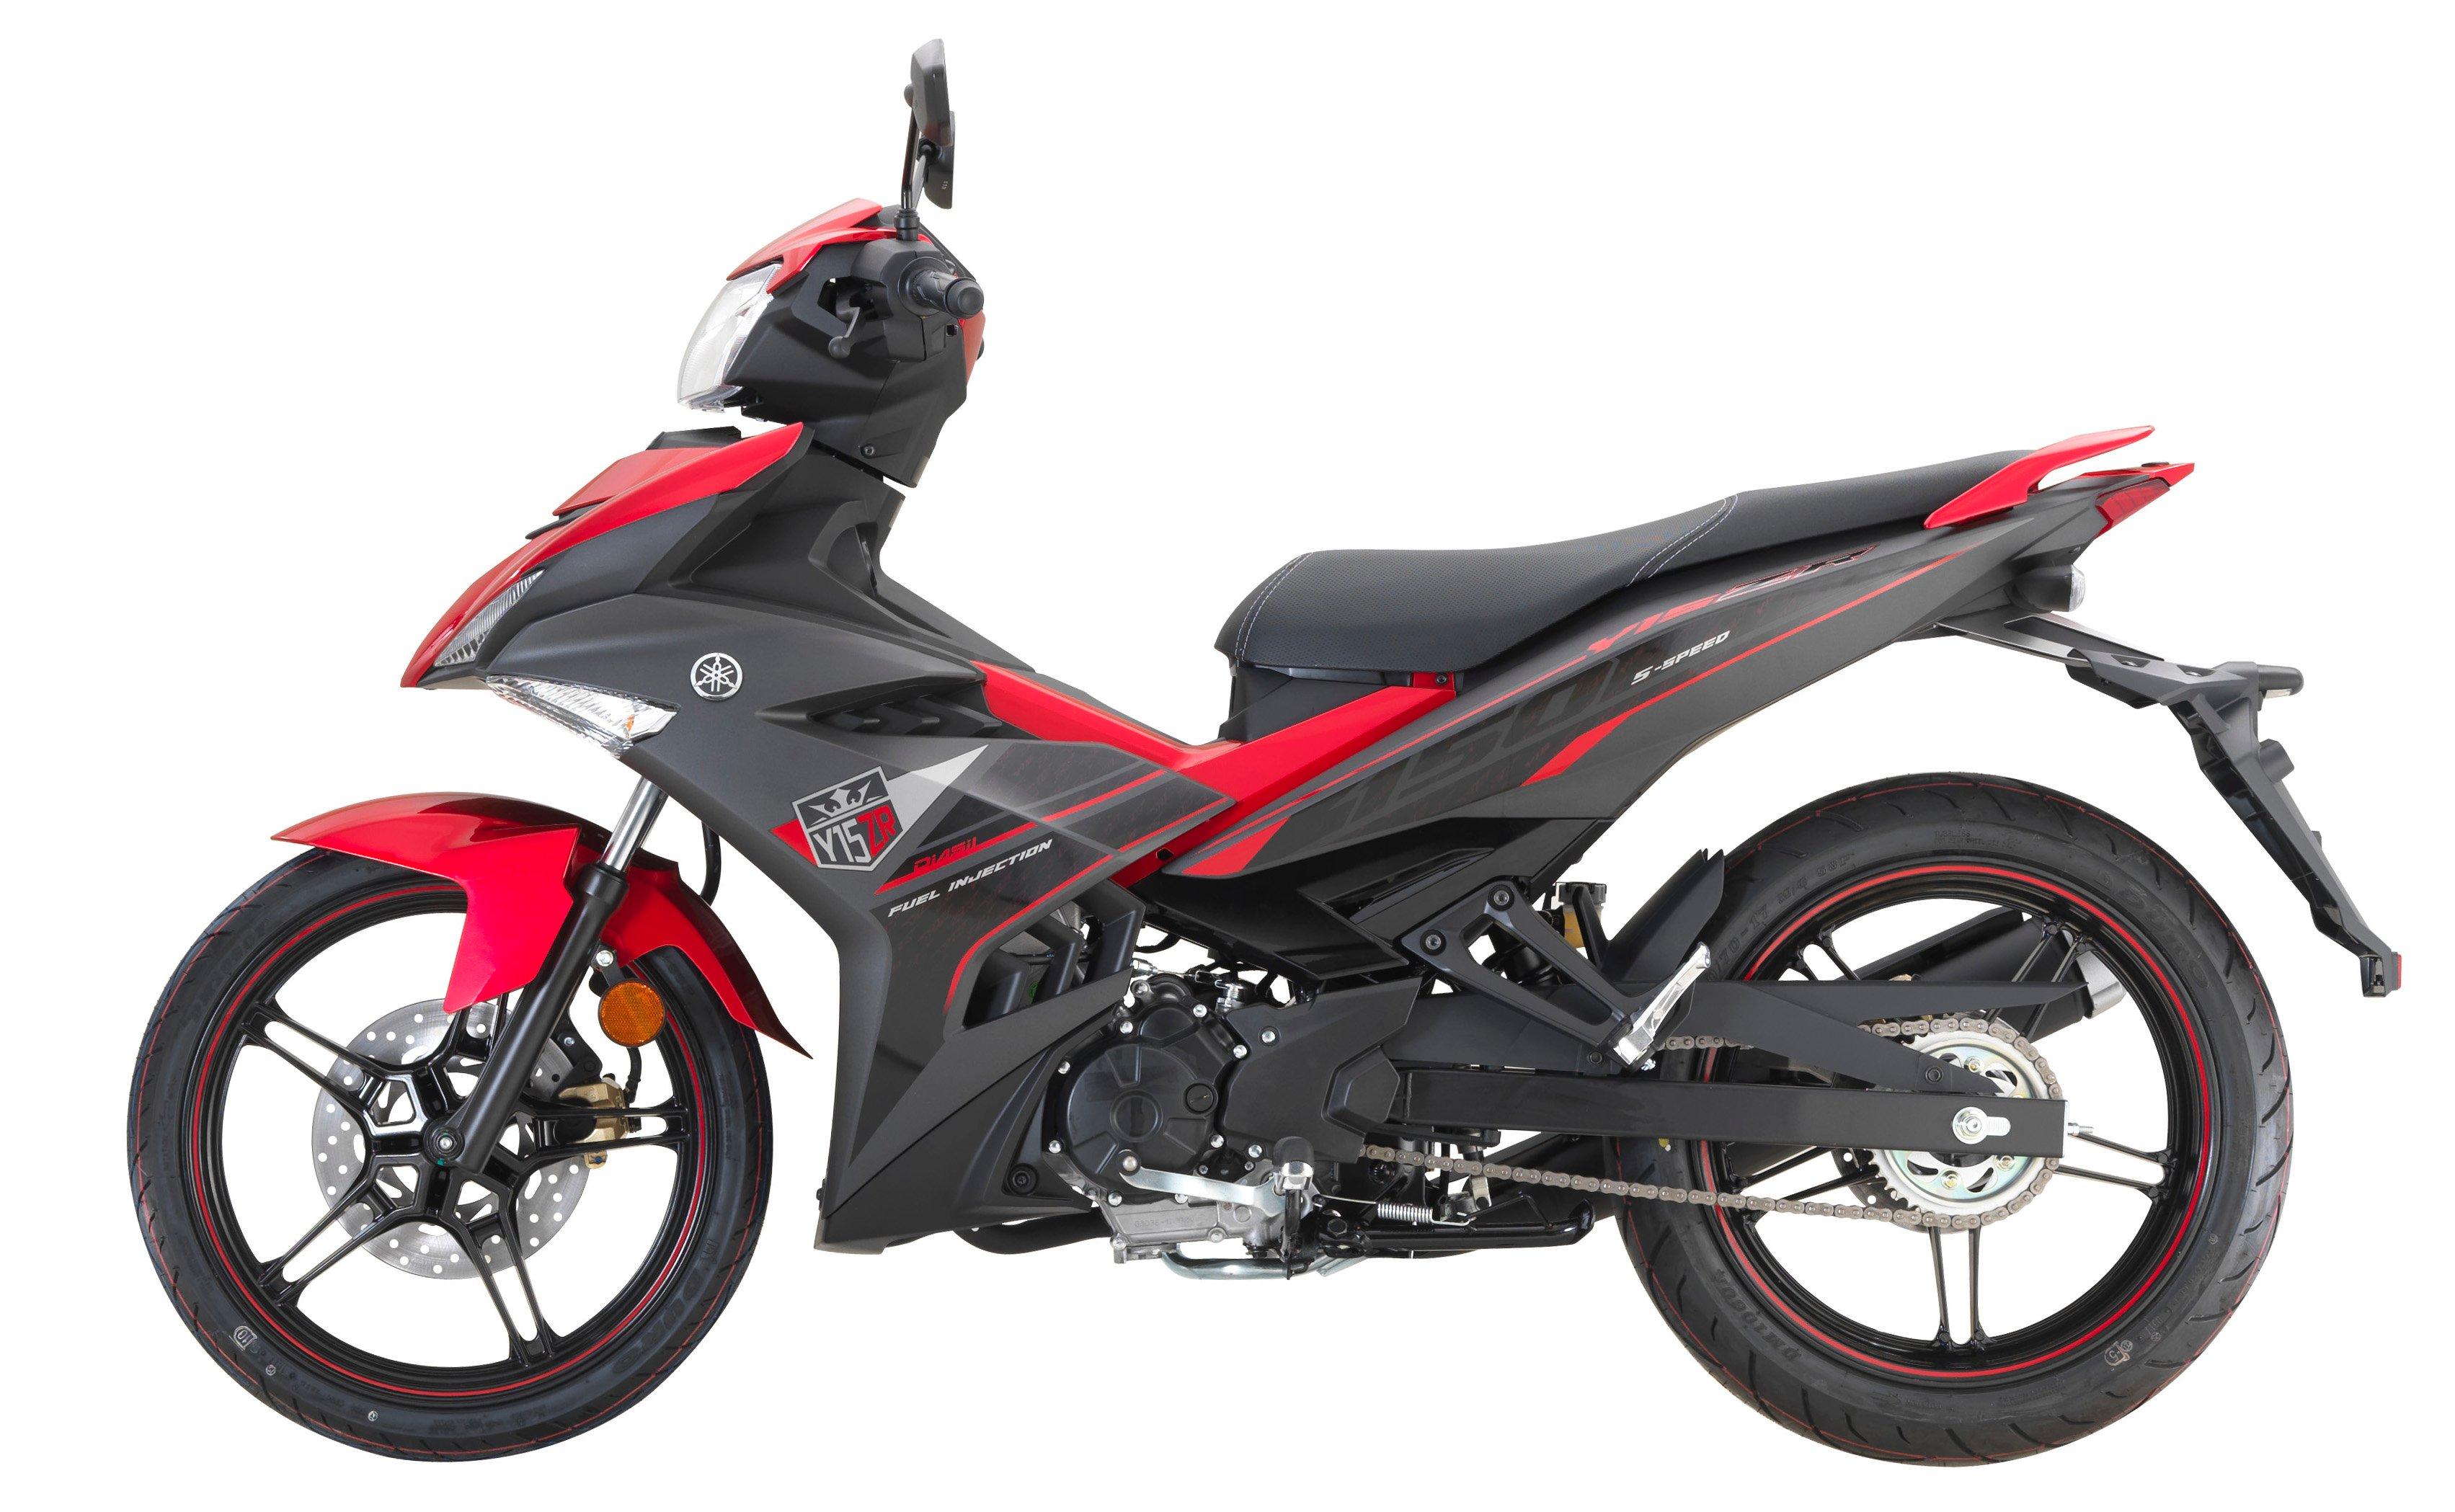 Dealer Sepeda Motor Honda Cengkareng-Harga Cash Kredit